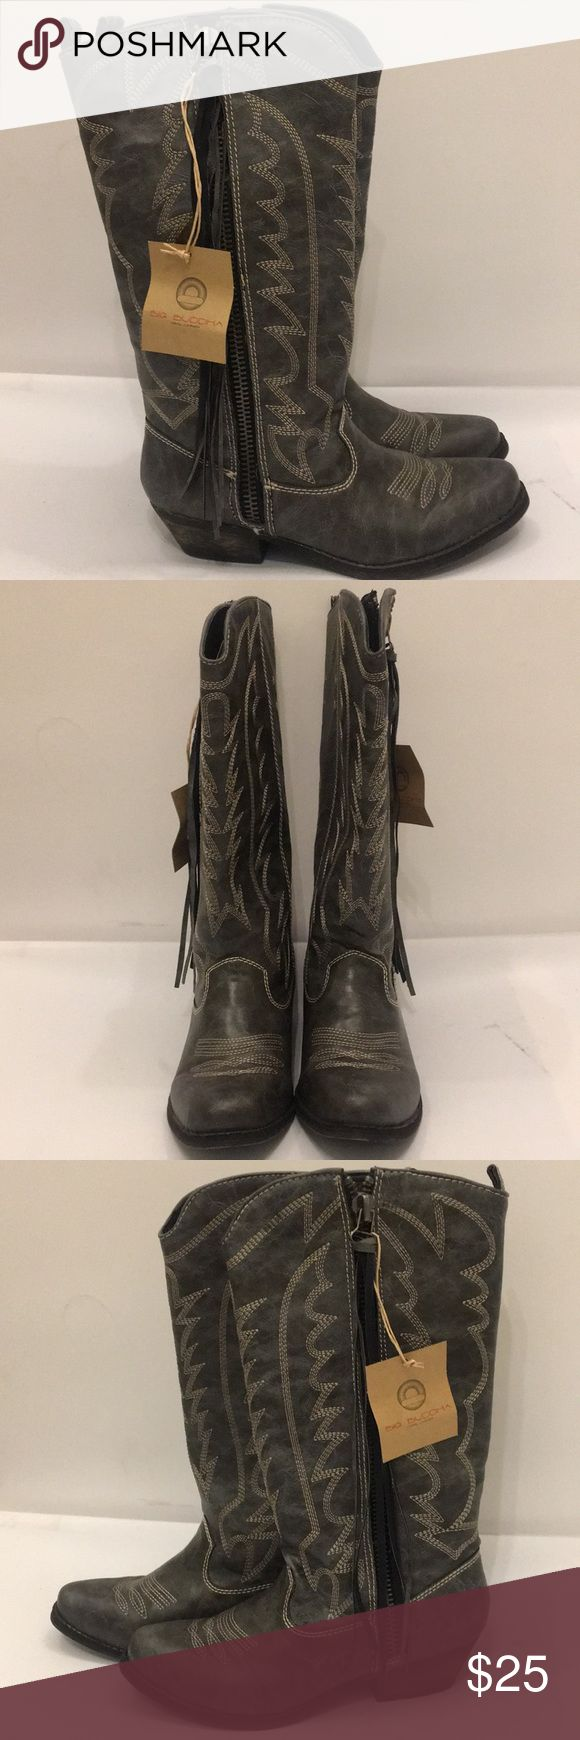 Big Buddha cowboy boots with fringe zipper Black cowboy boots with fringe tassel zippers Big Buddha Shoes Heeled Boots